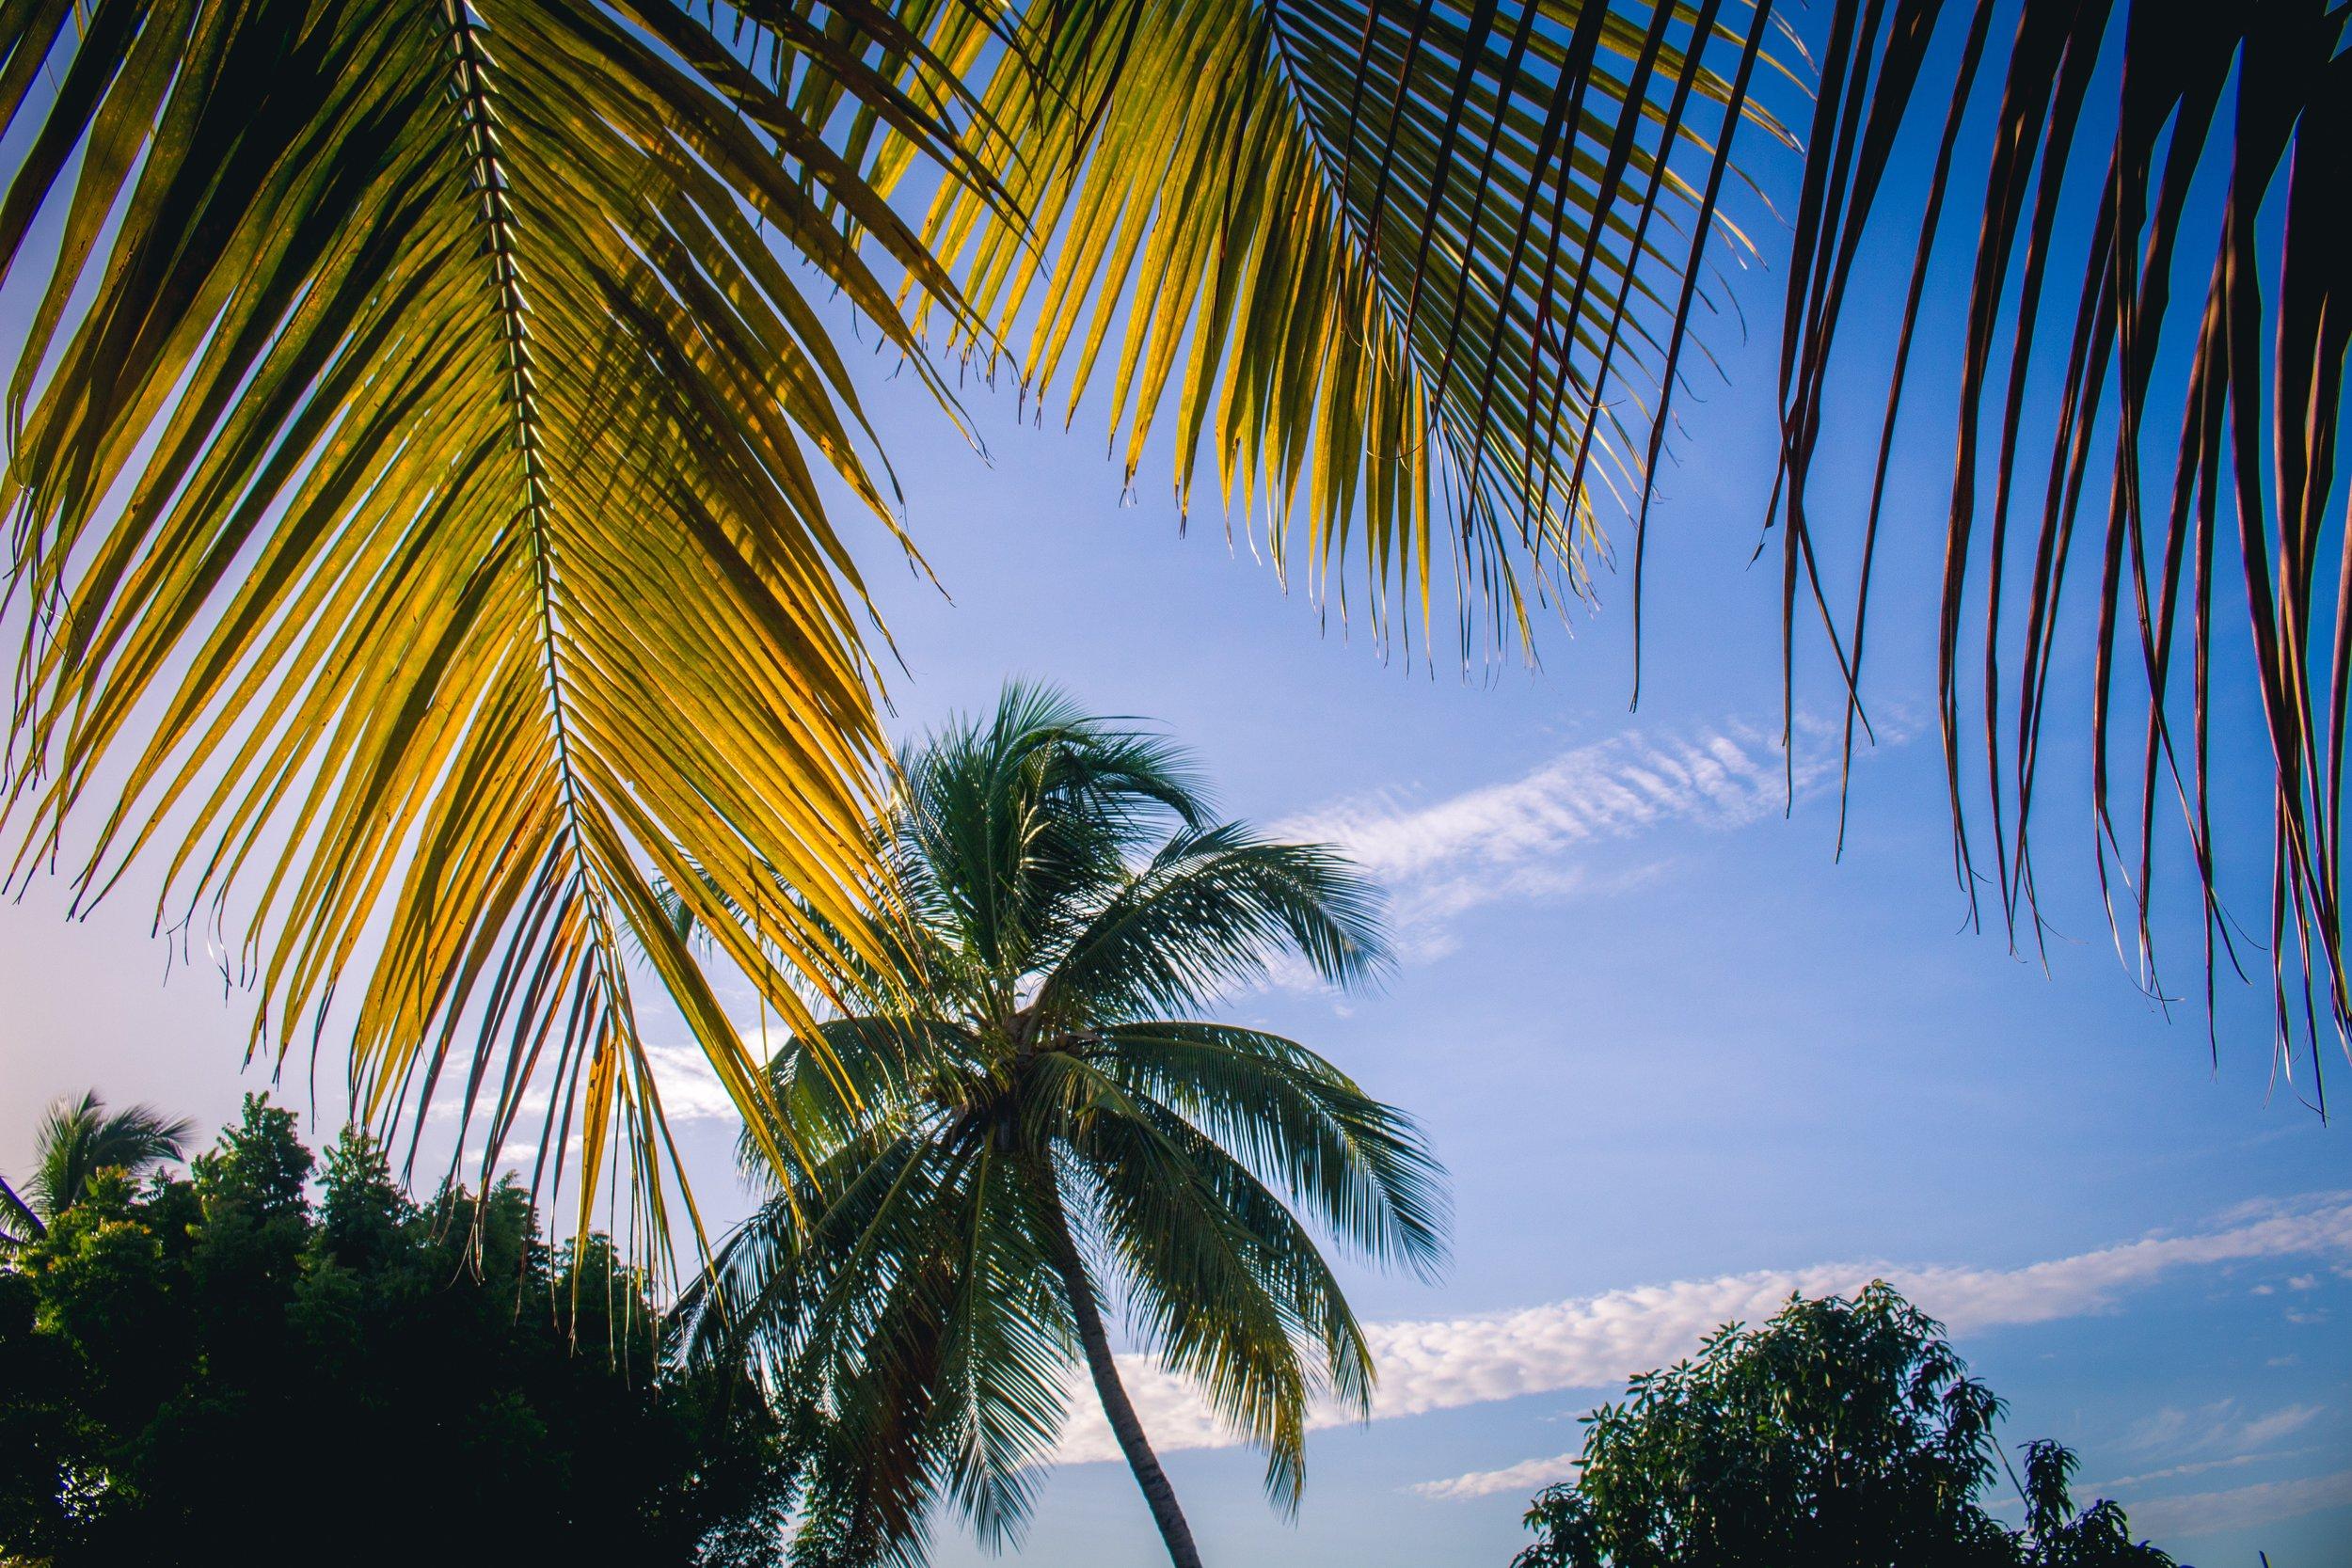 palm trees in Keta, Volta Region